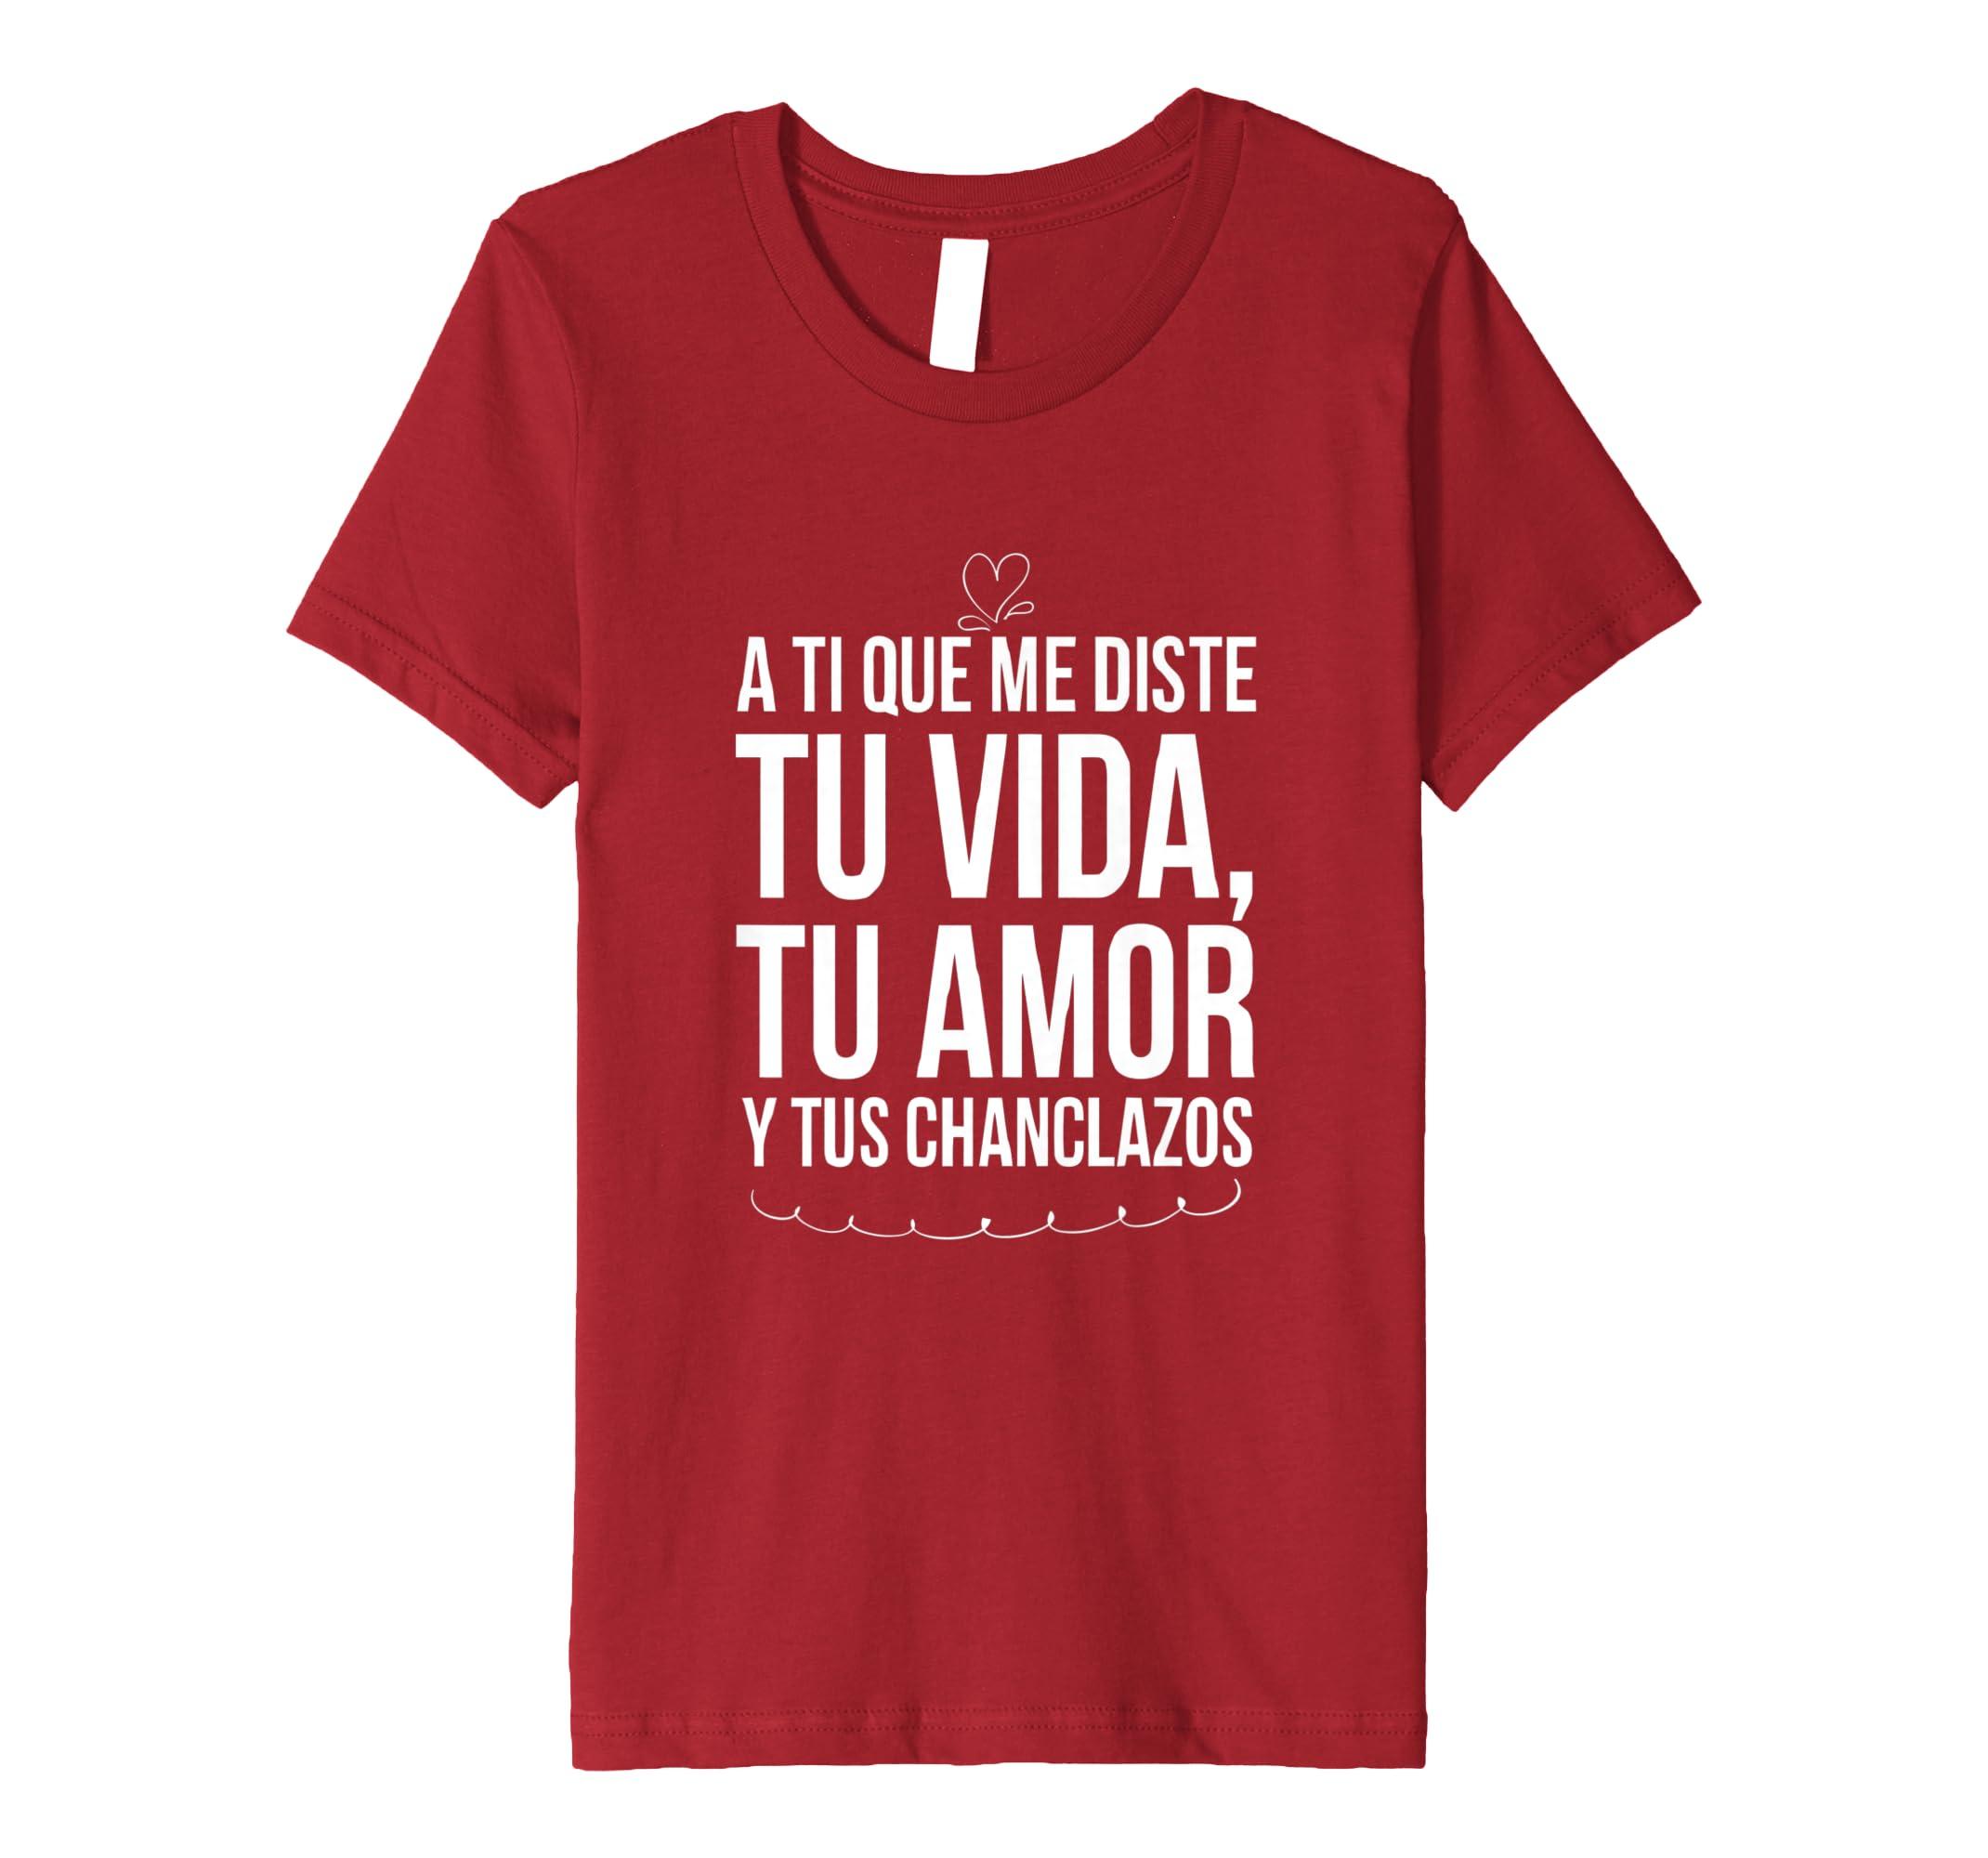 Amazon.com: Camisetas Para Madres Tu Vida tu Amor y tus Chanclazos: Clothing